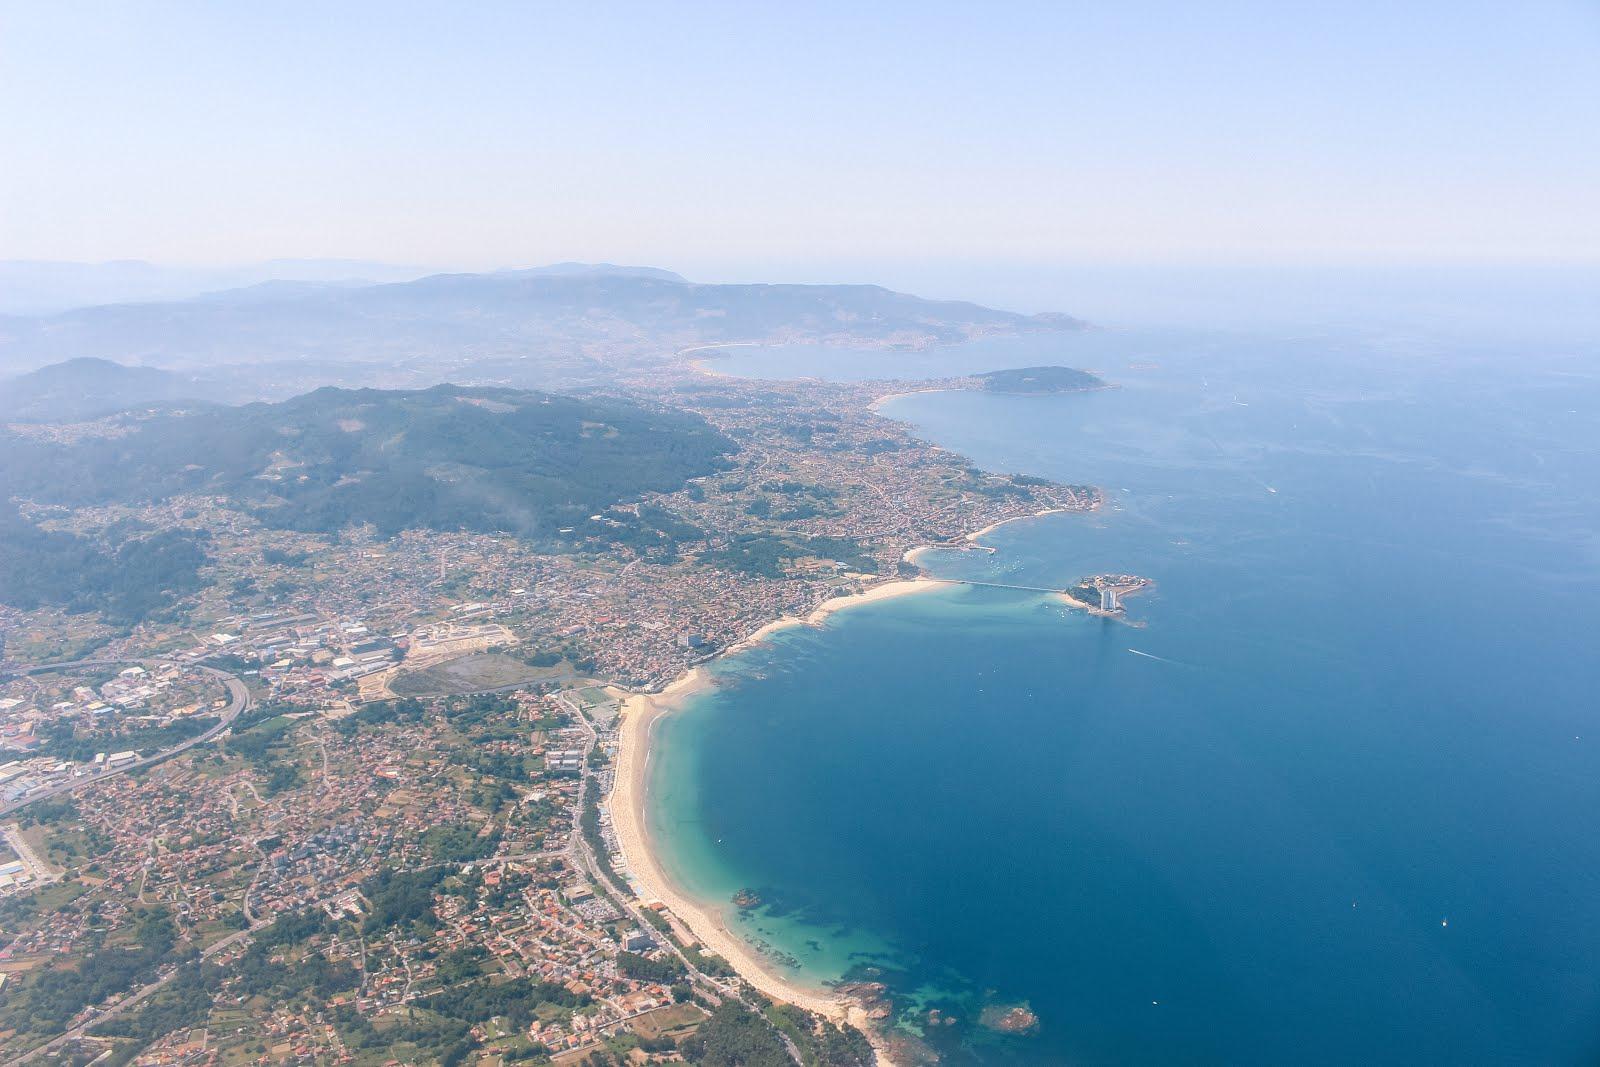 Sobrevolando las playas de Vigo